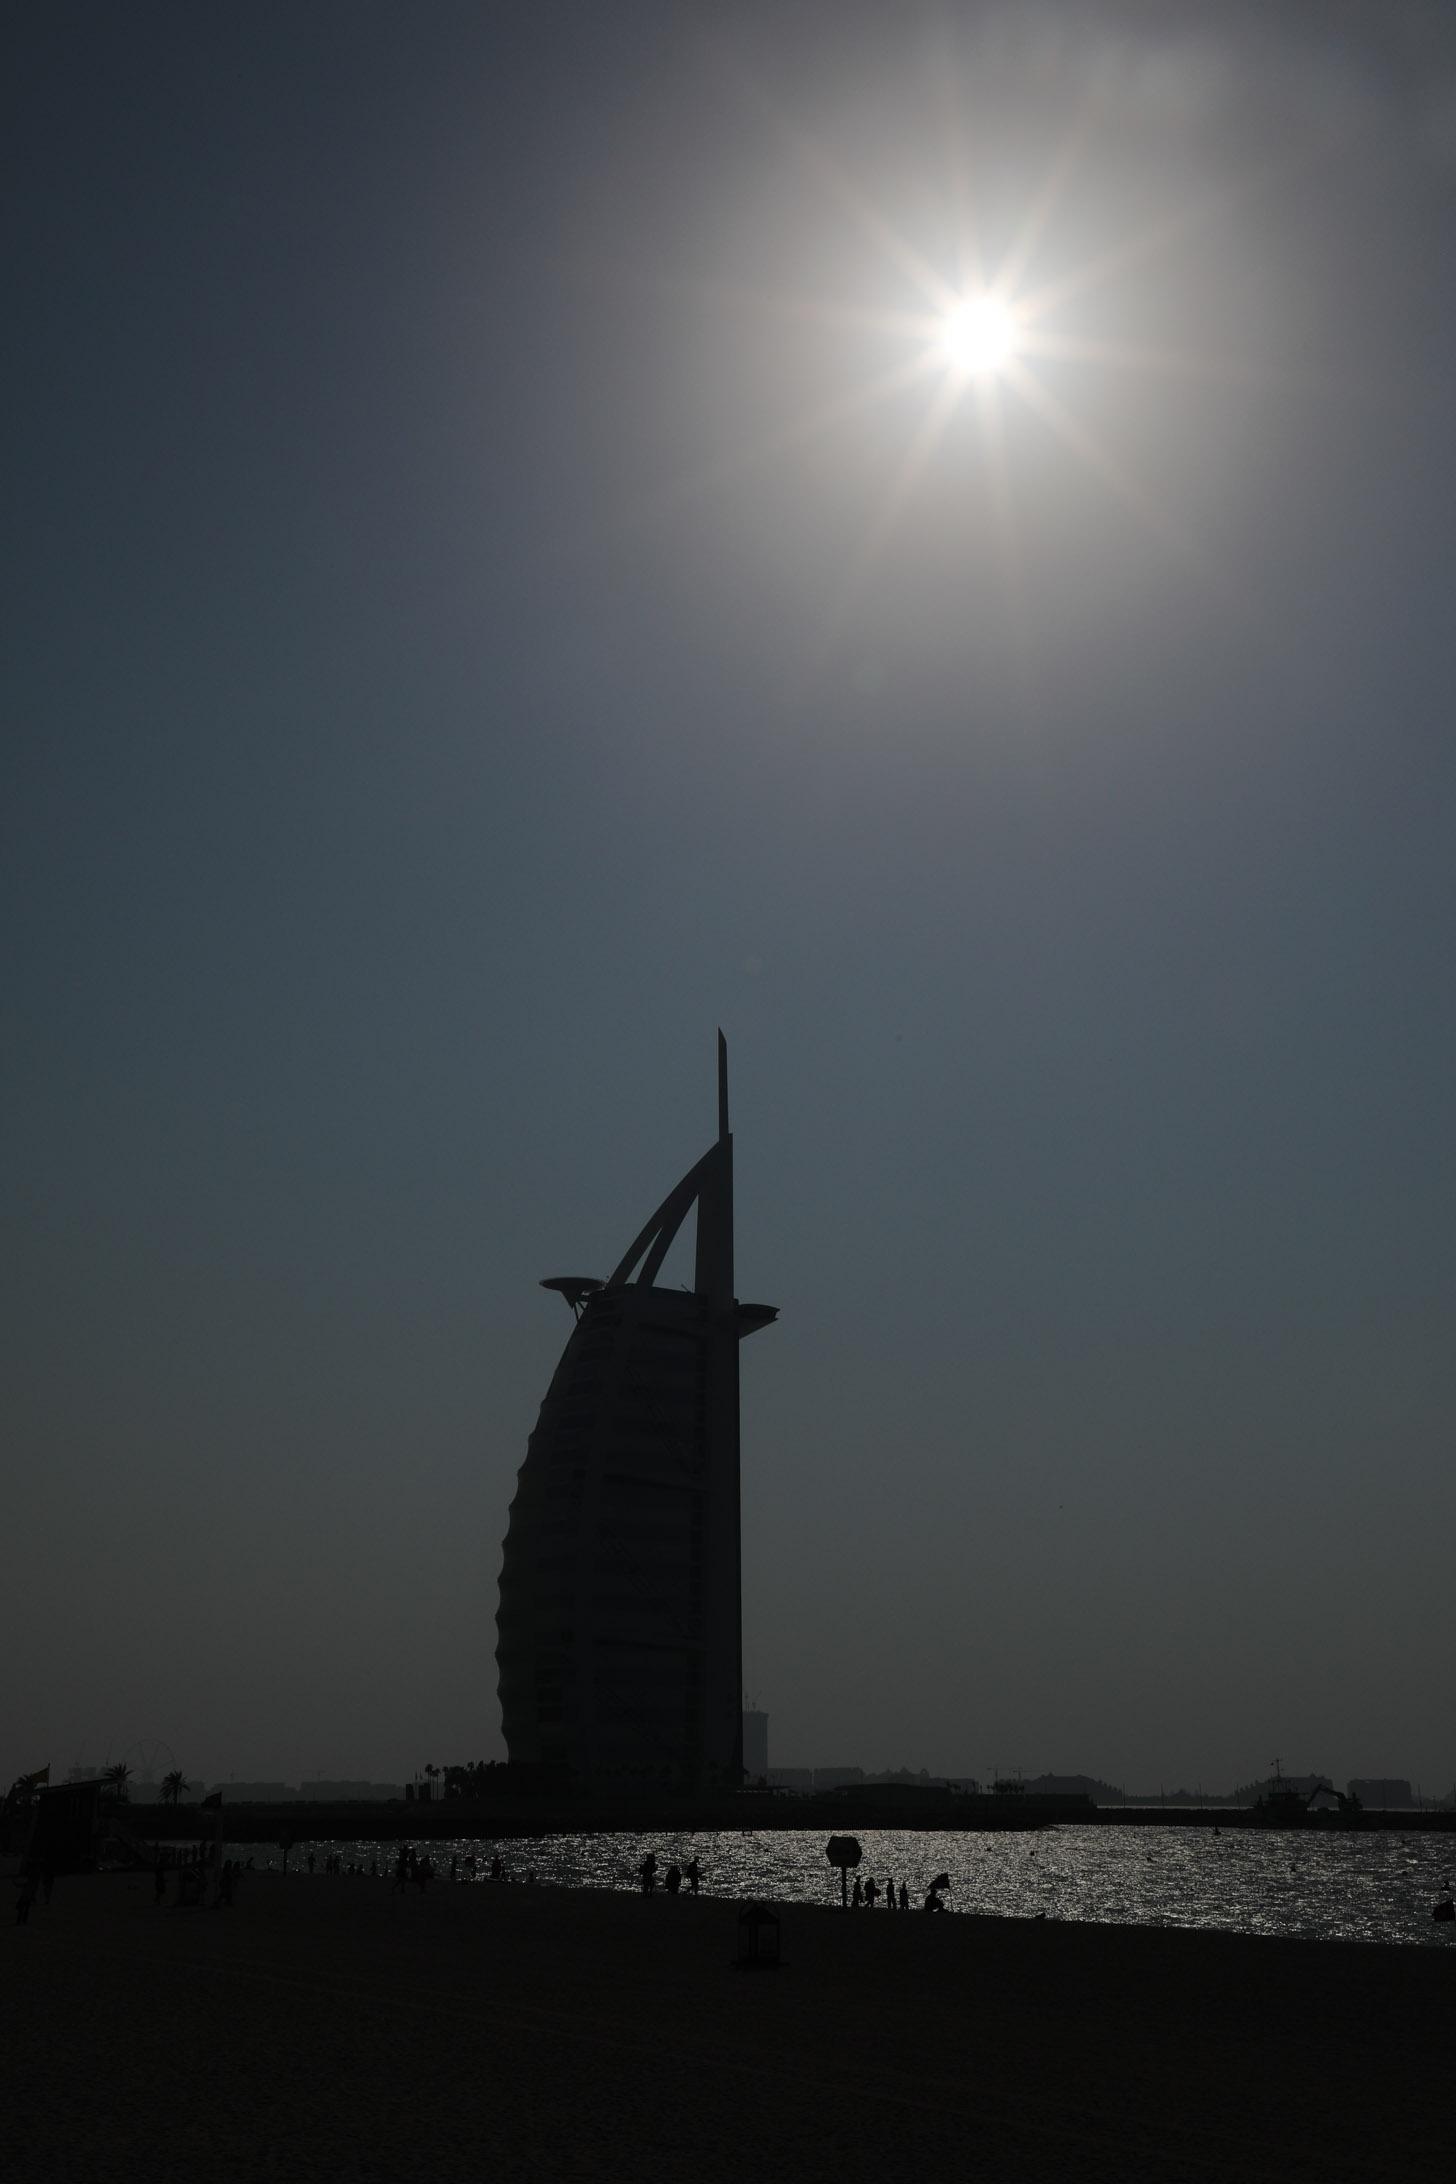 Burj al Arab met tegenlicht